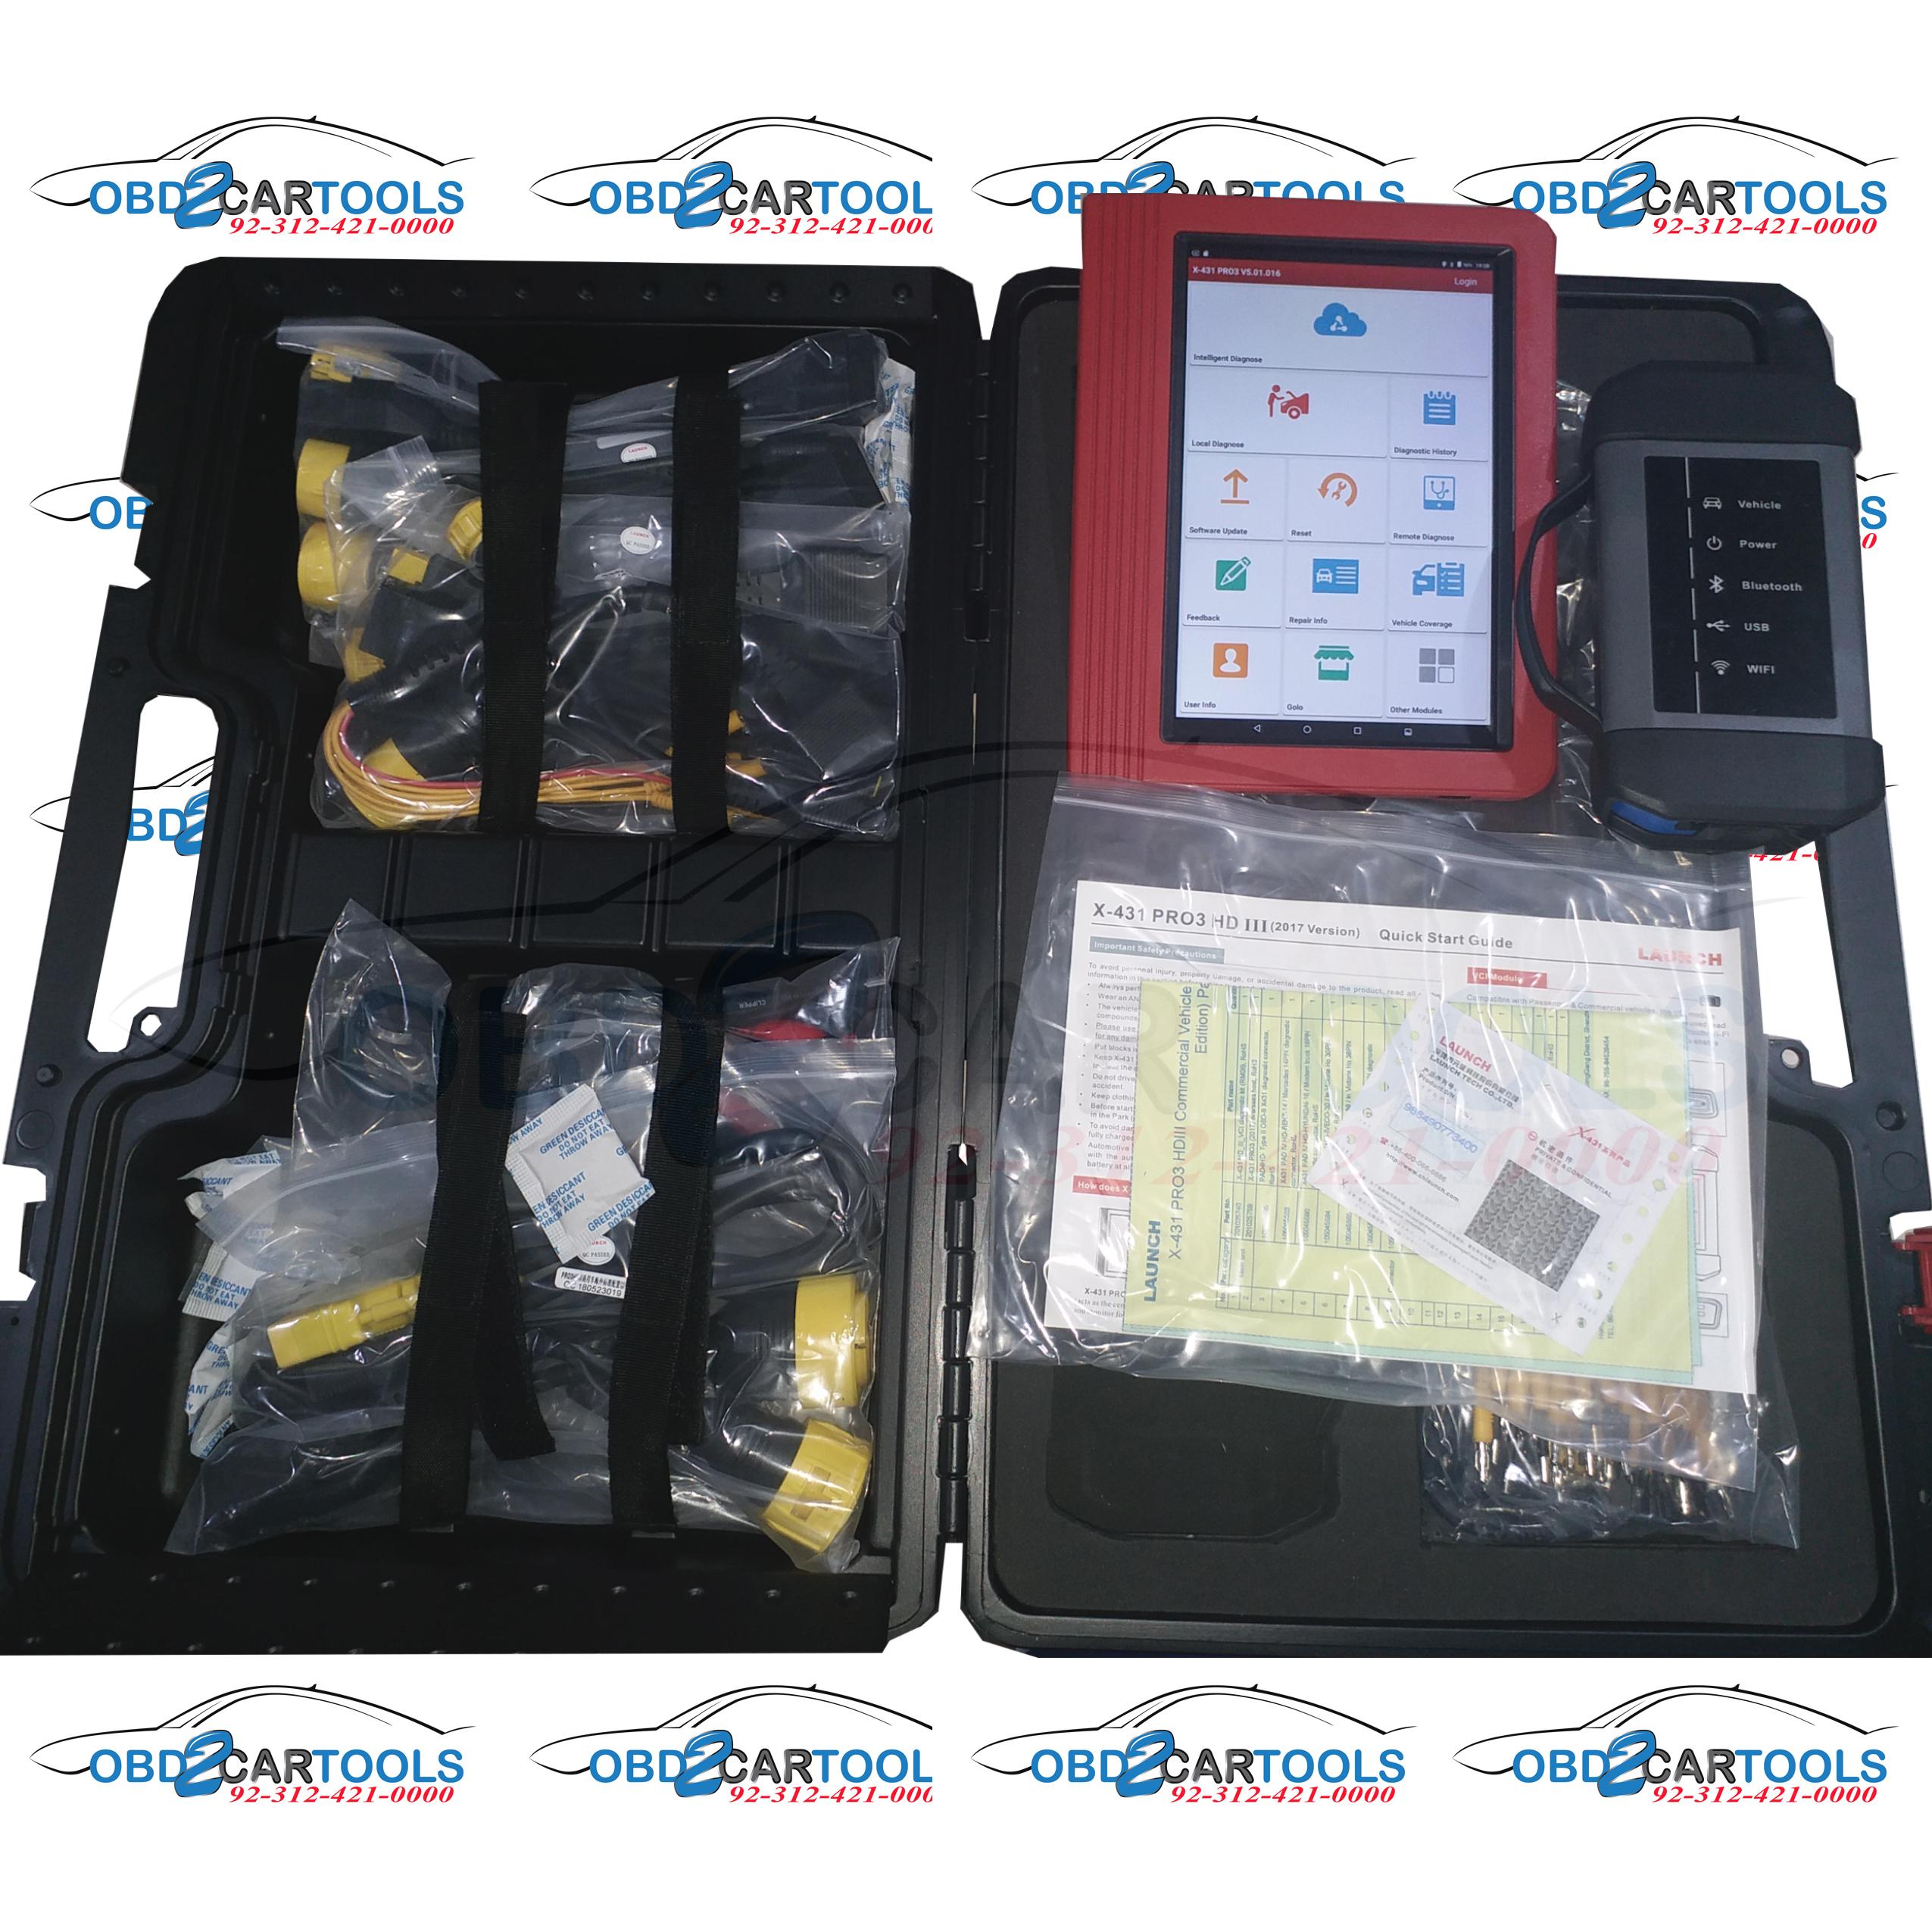 Launch scan tool x431 pro3 | Launch X431 Pro 3 Reviews  2019-02-20